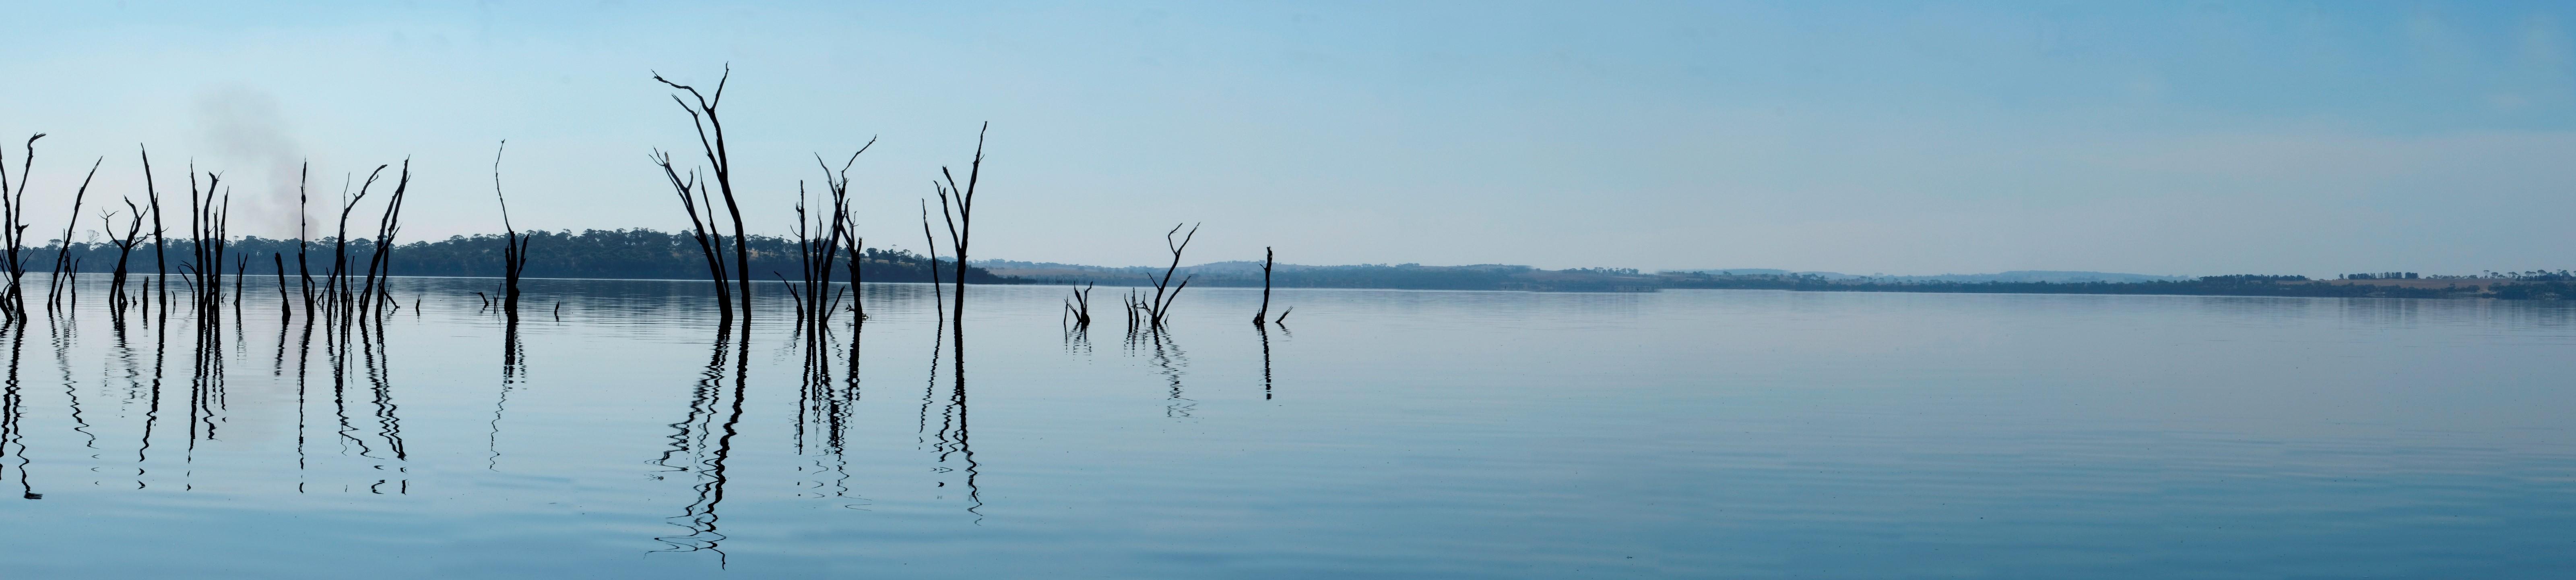 Lake Dumbleyung Panorama - by Christine Bairstow LG